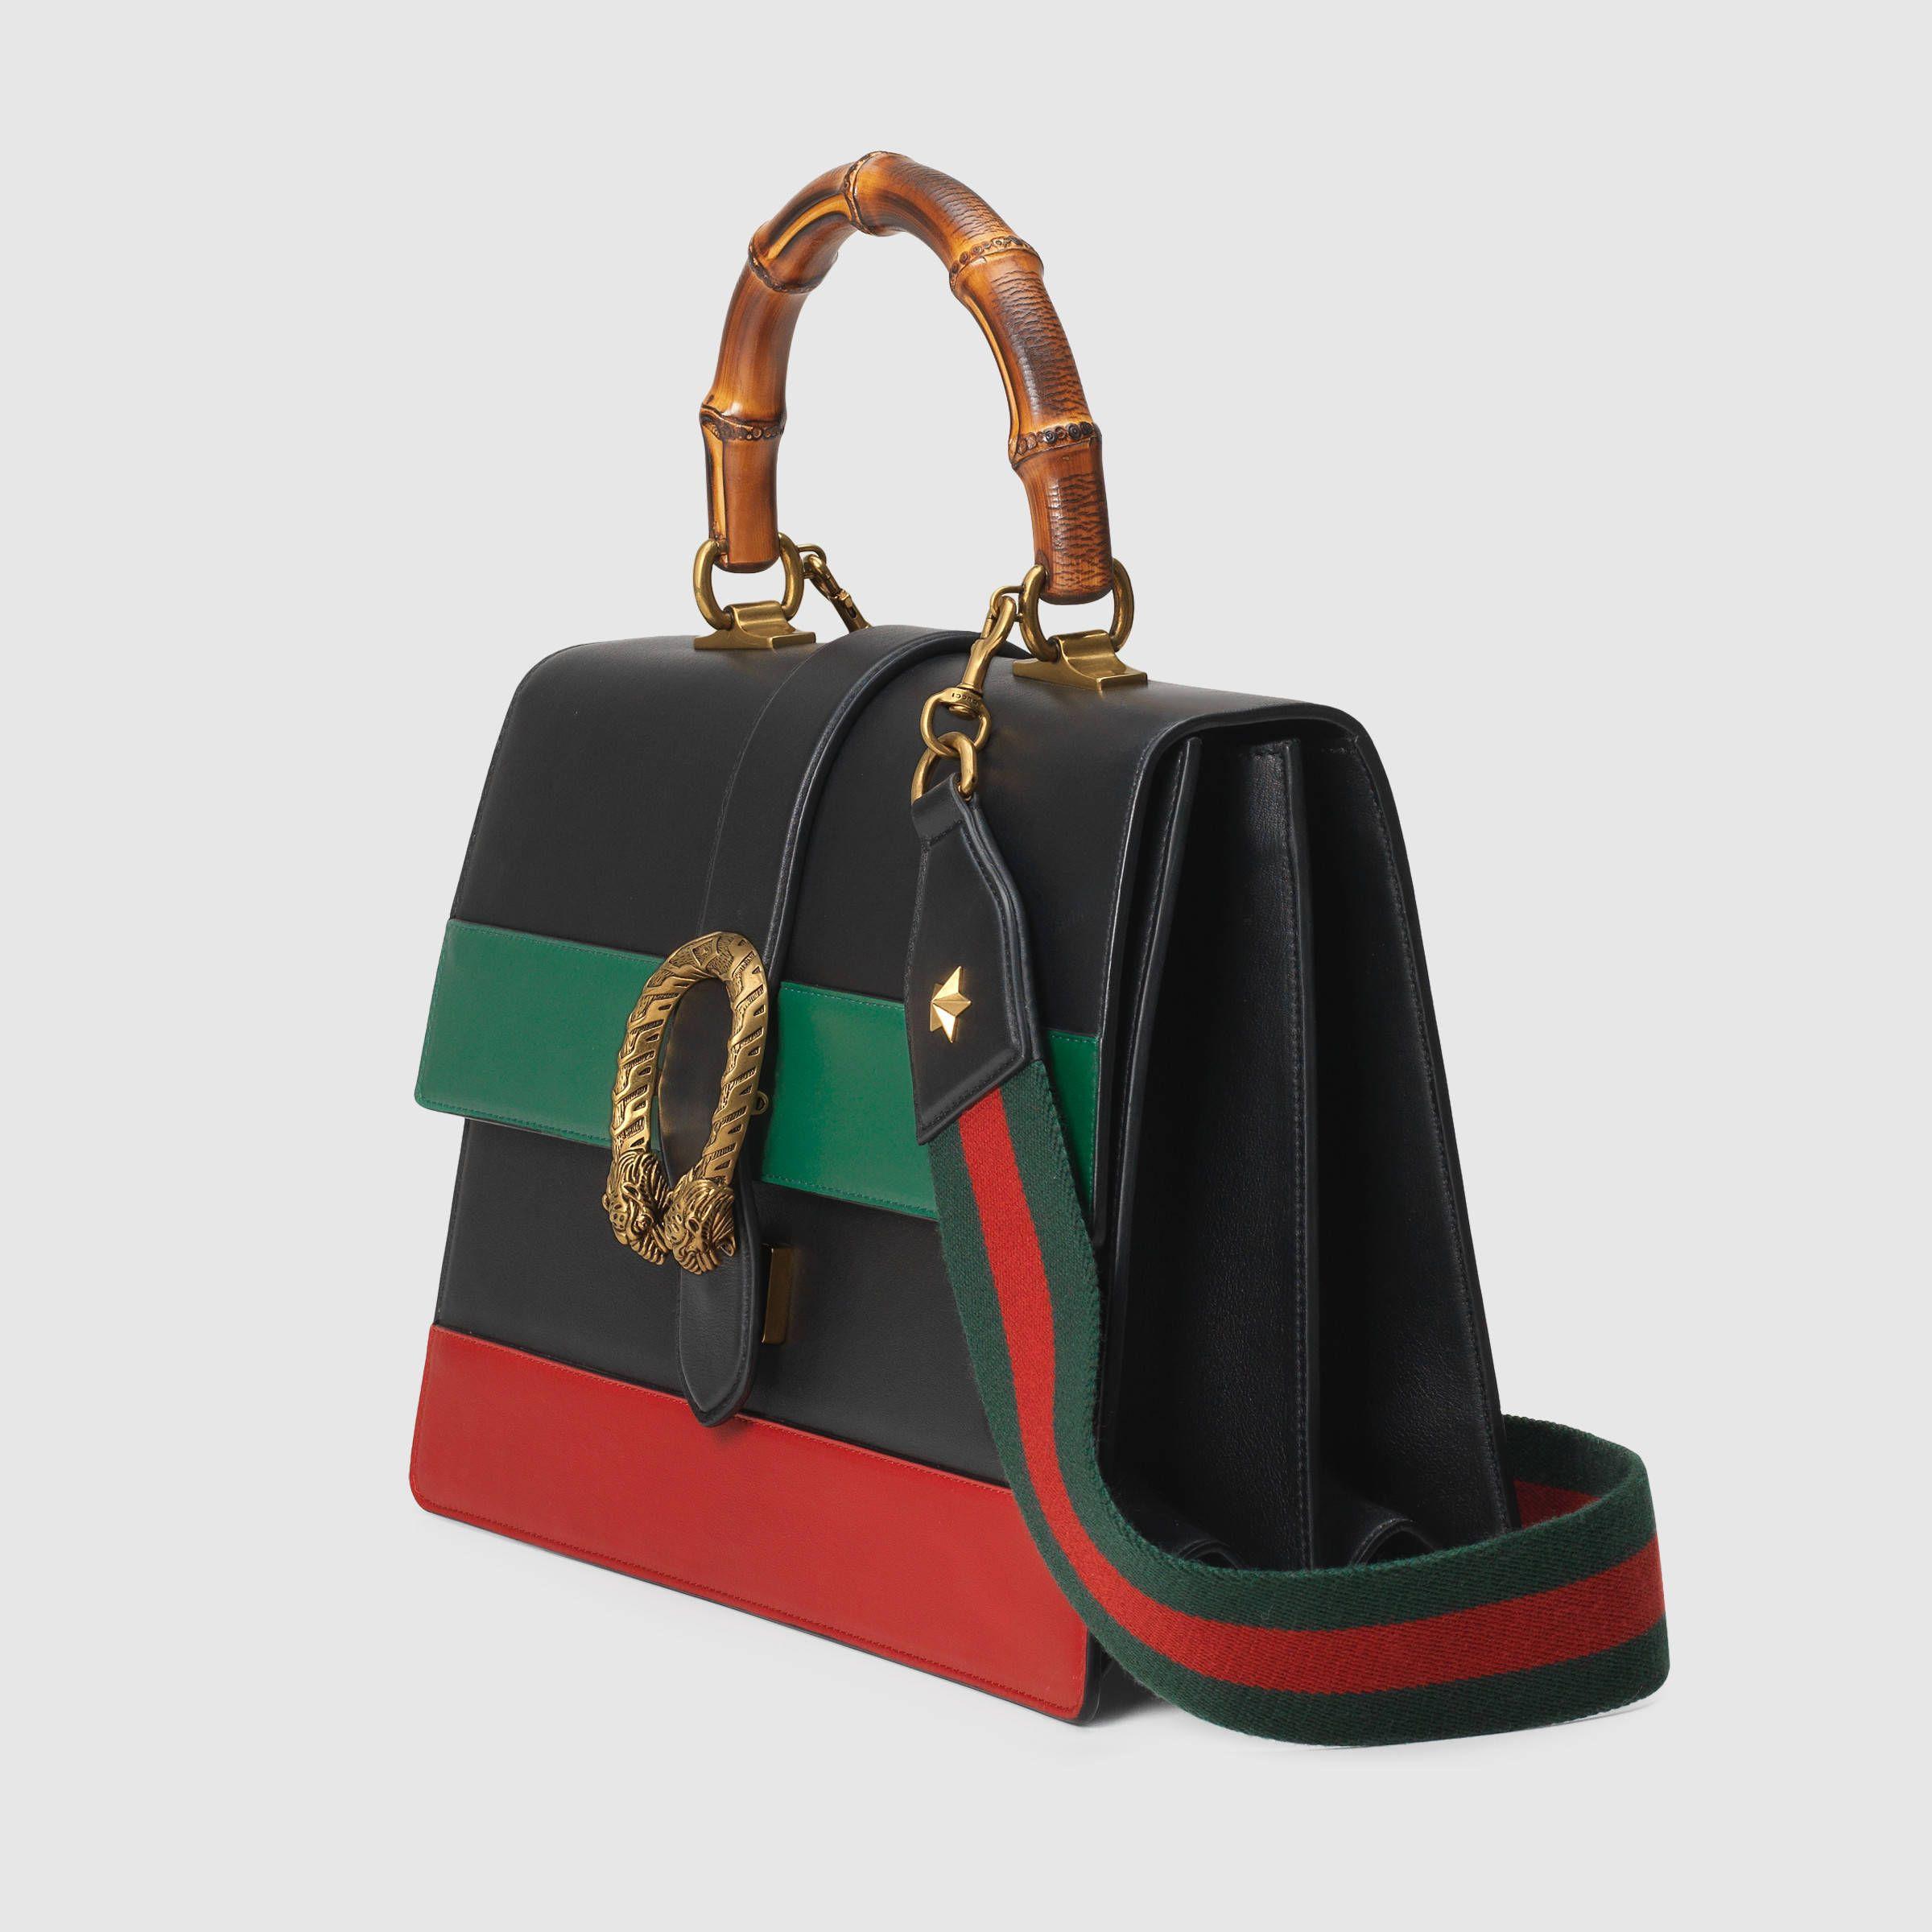 gucci bags price list. gucci bags price list